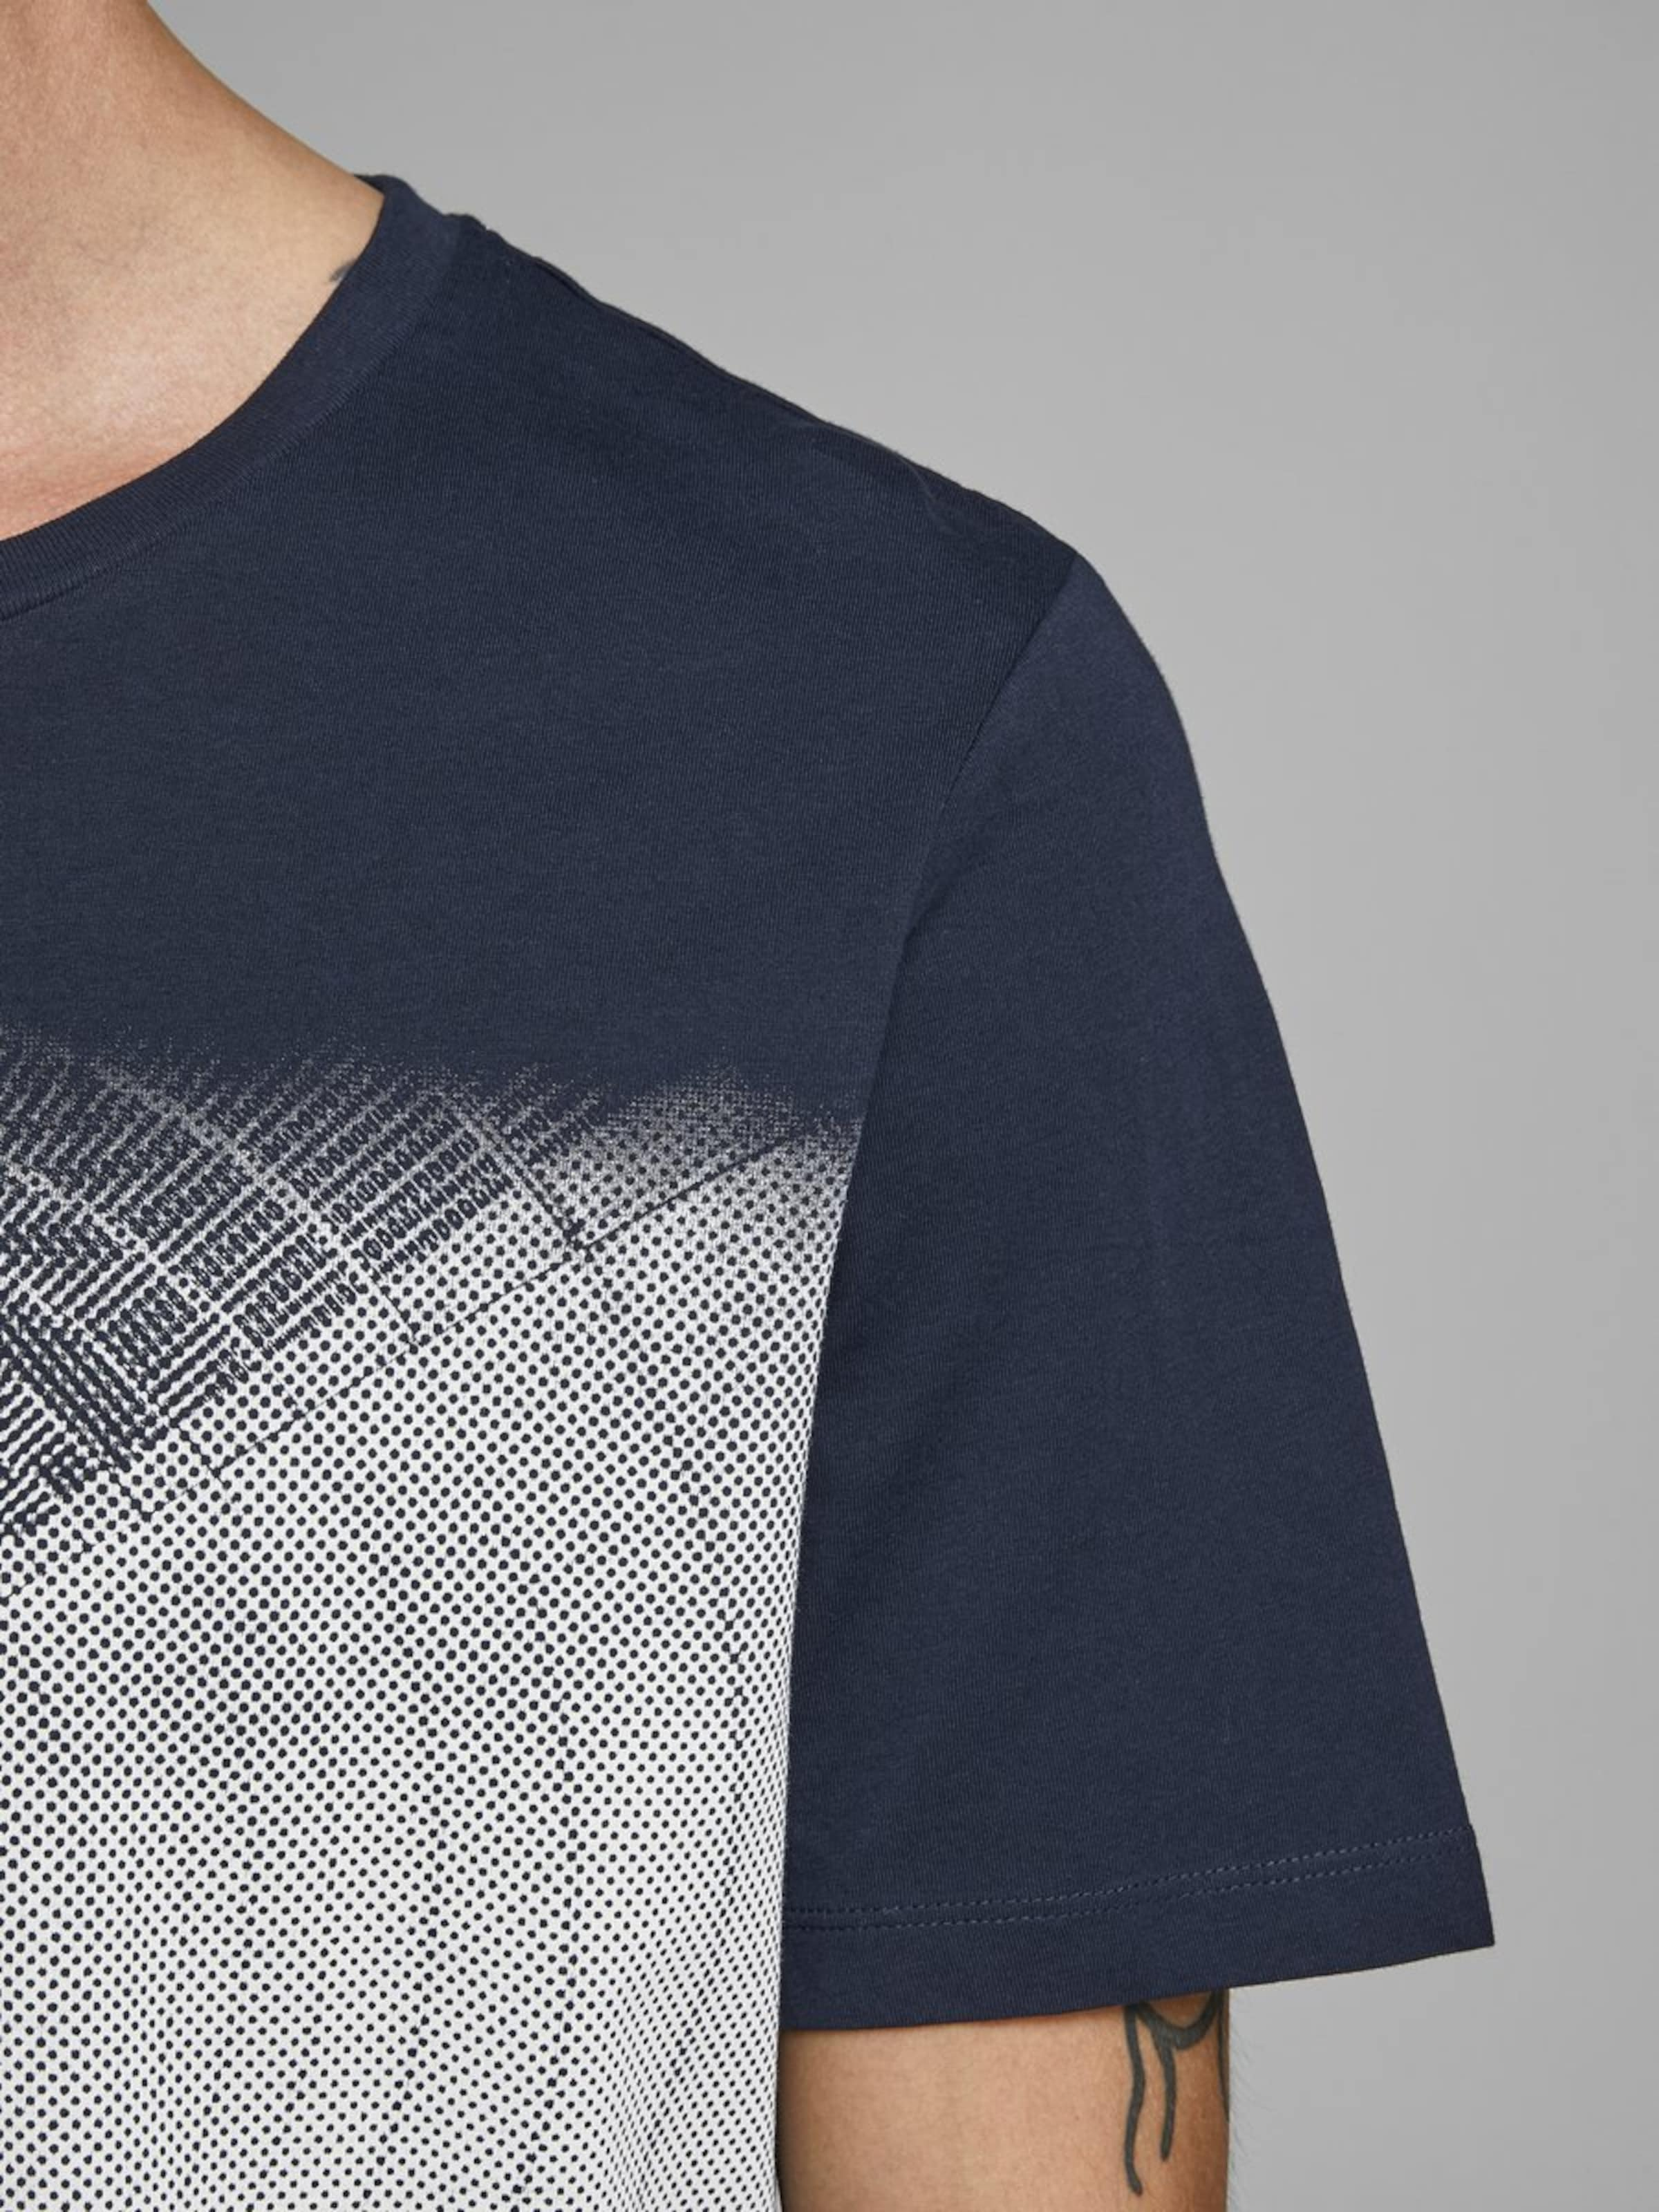 Weiß In NachtblauGraumeliert shirt Jackamp; T Jones 76fYvbgy